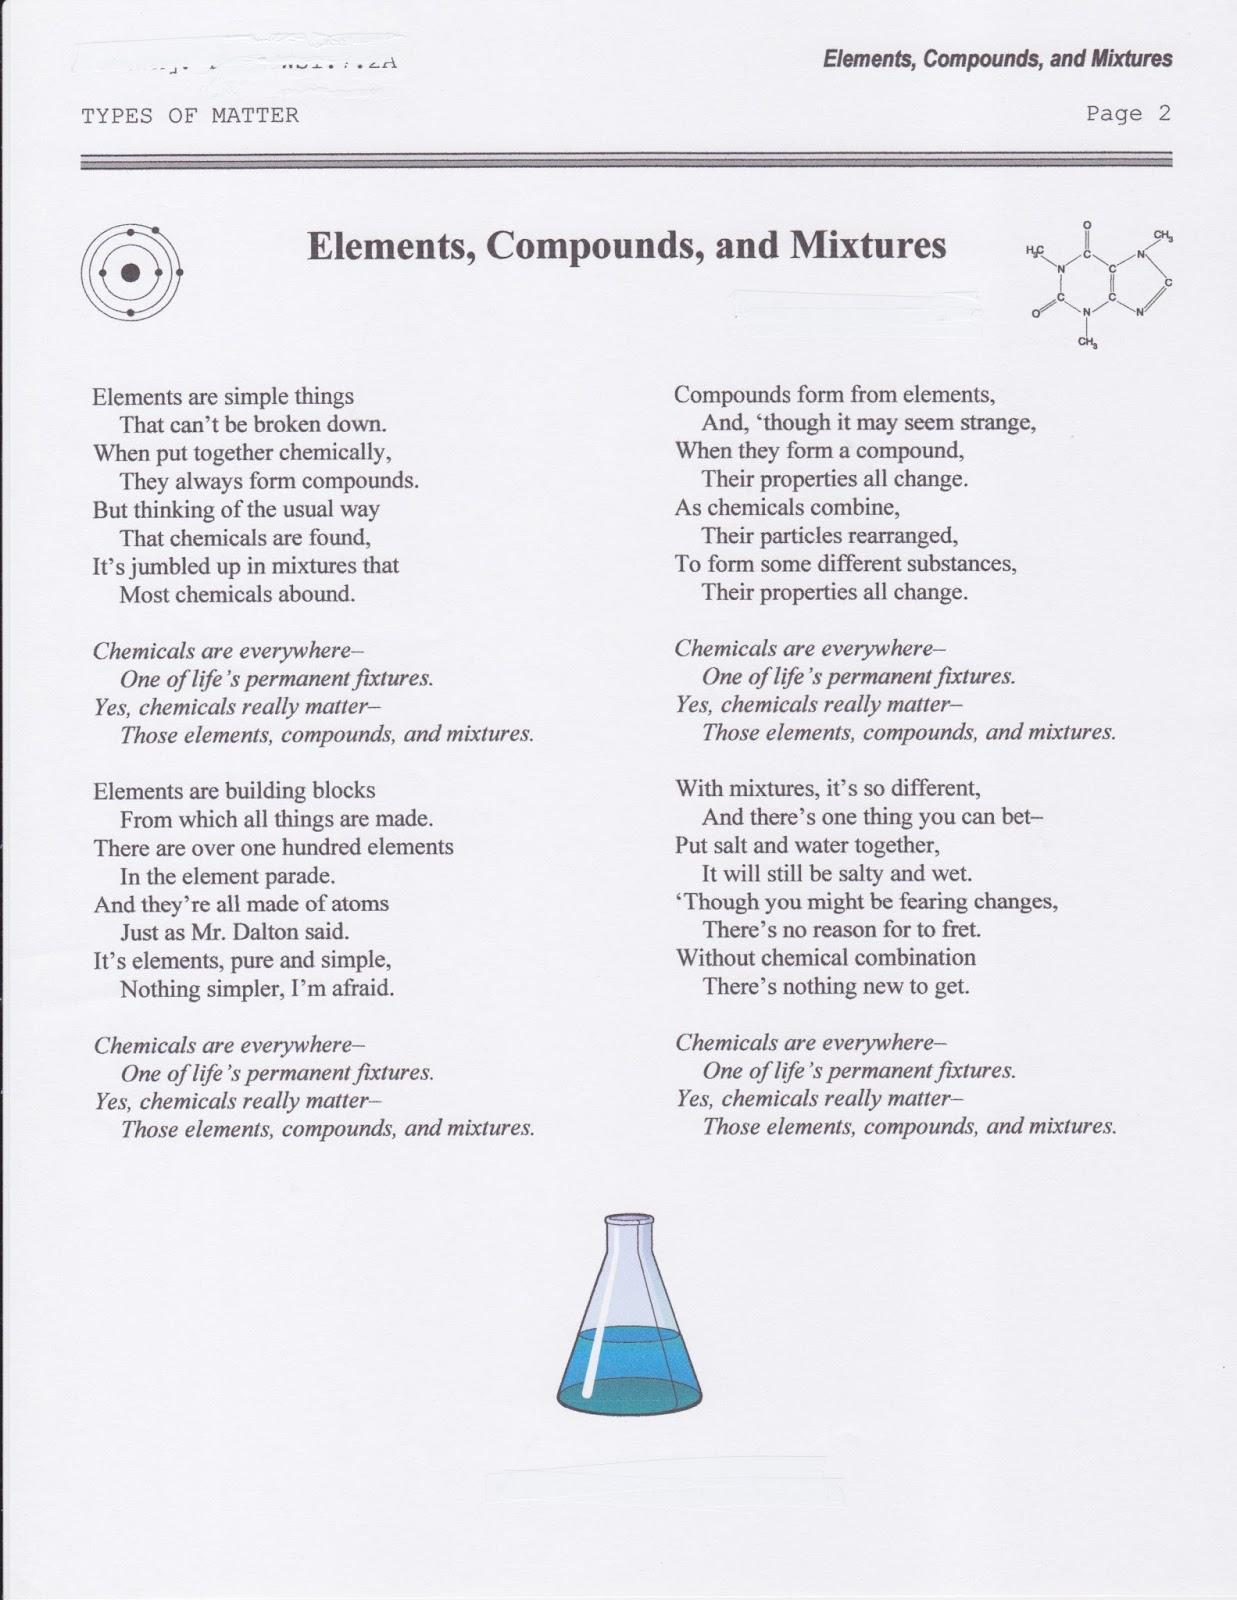 Dr. Gayden's Chemistry Class: September 2015